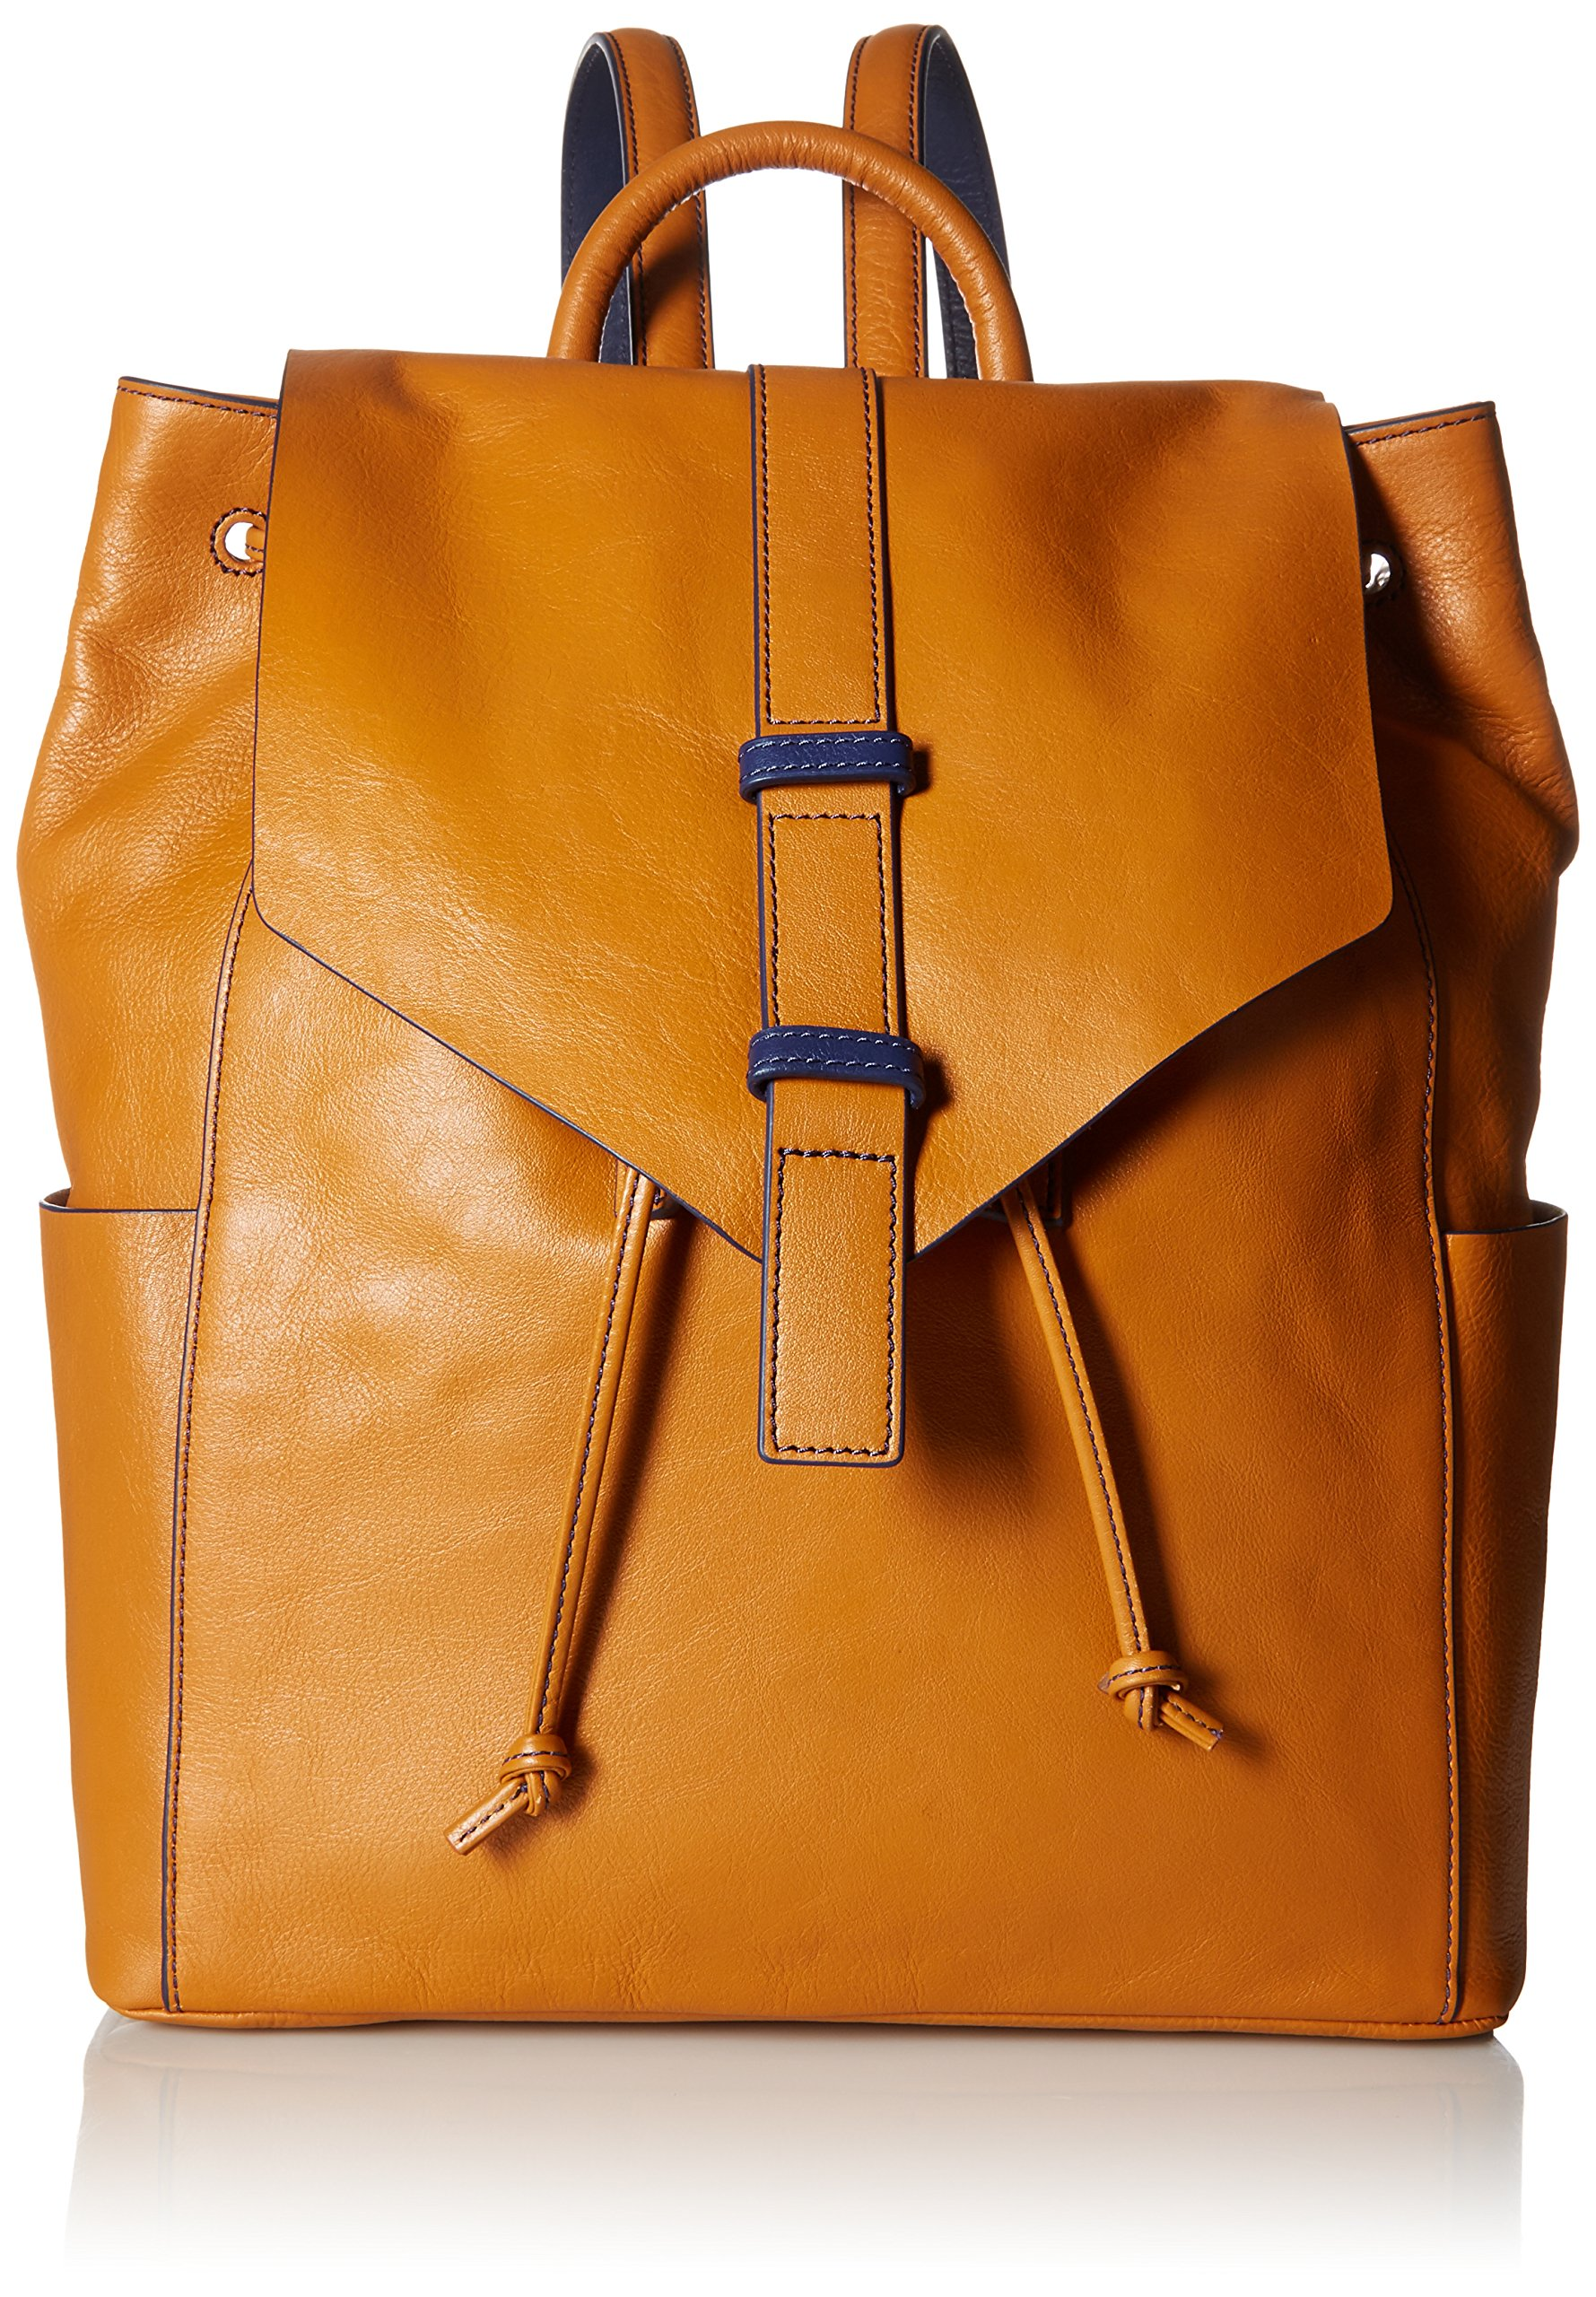 Vera Bradley Women's Big Sky Backpack, Golden Tan by Vera Bradley (Image #1)